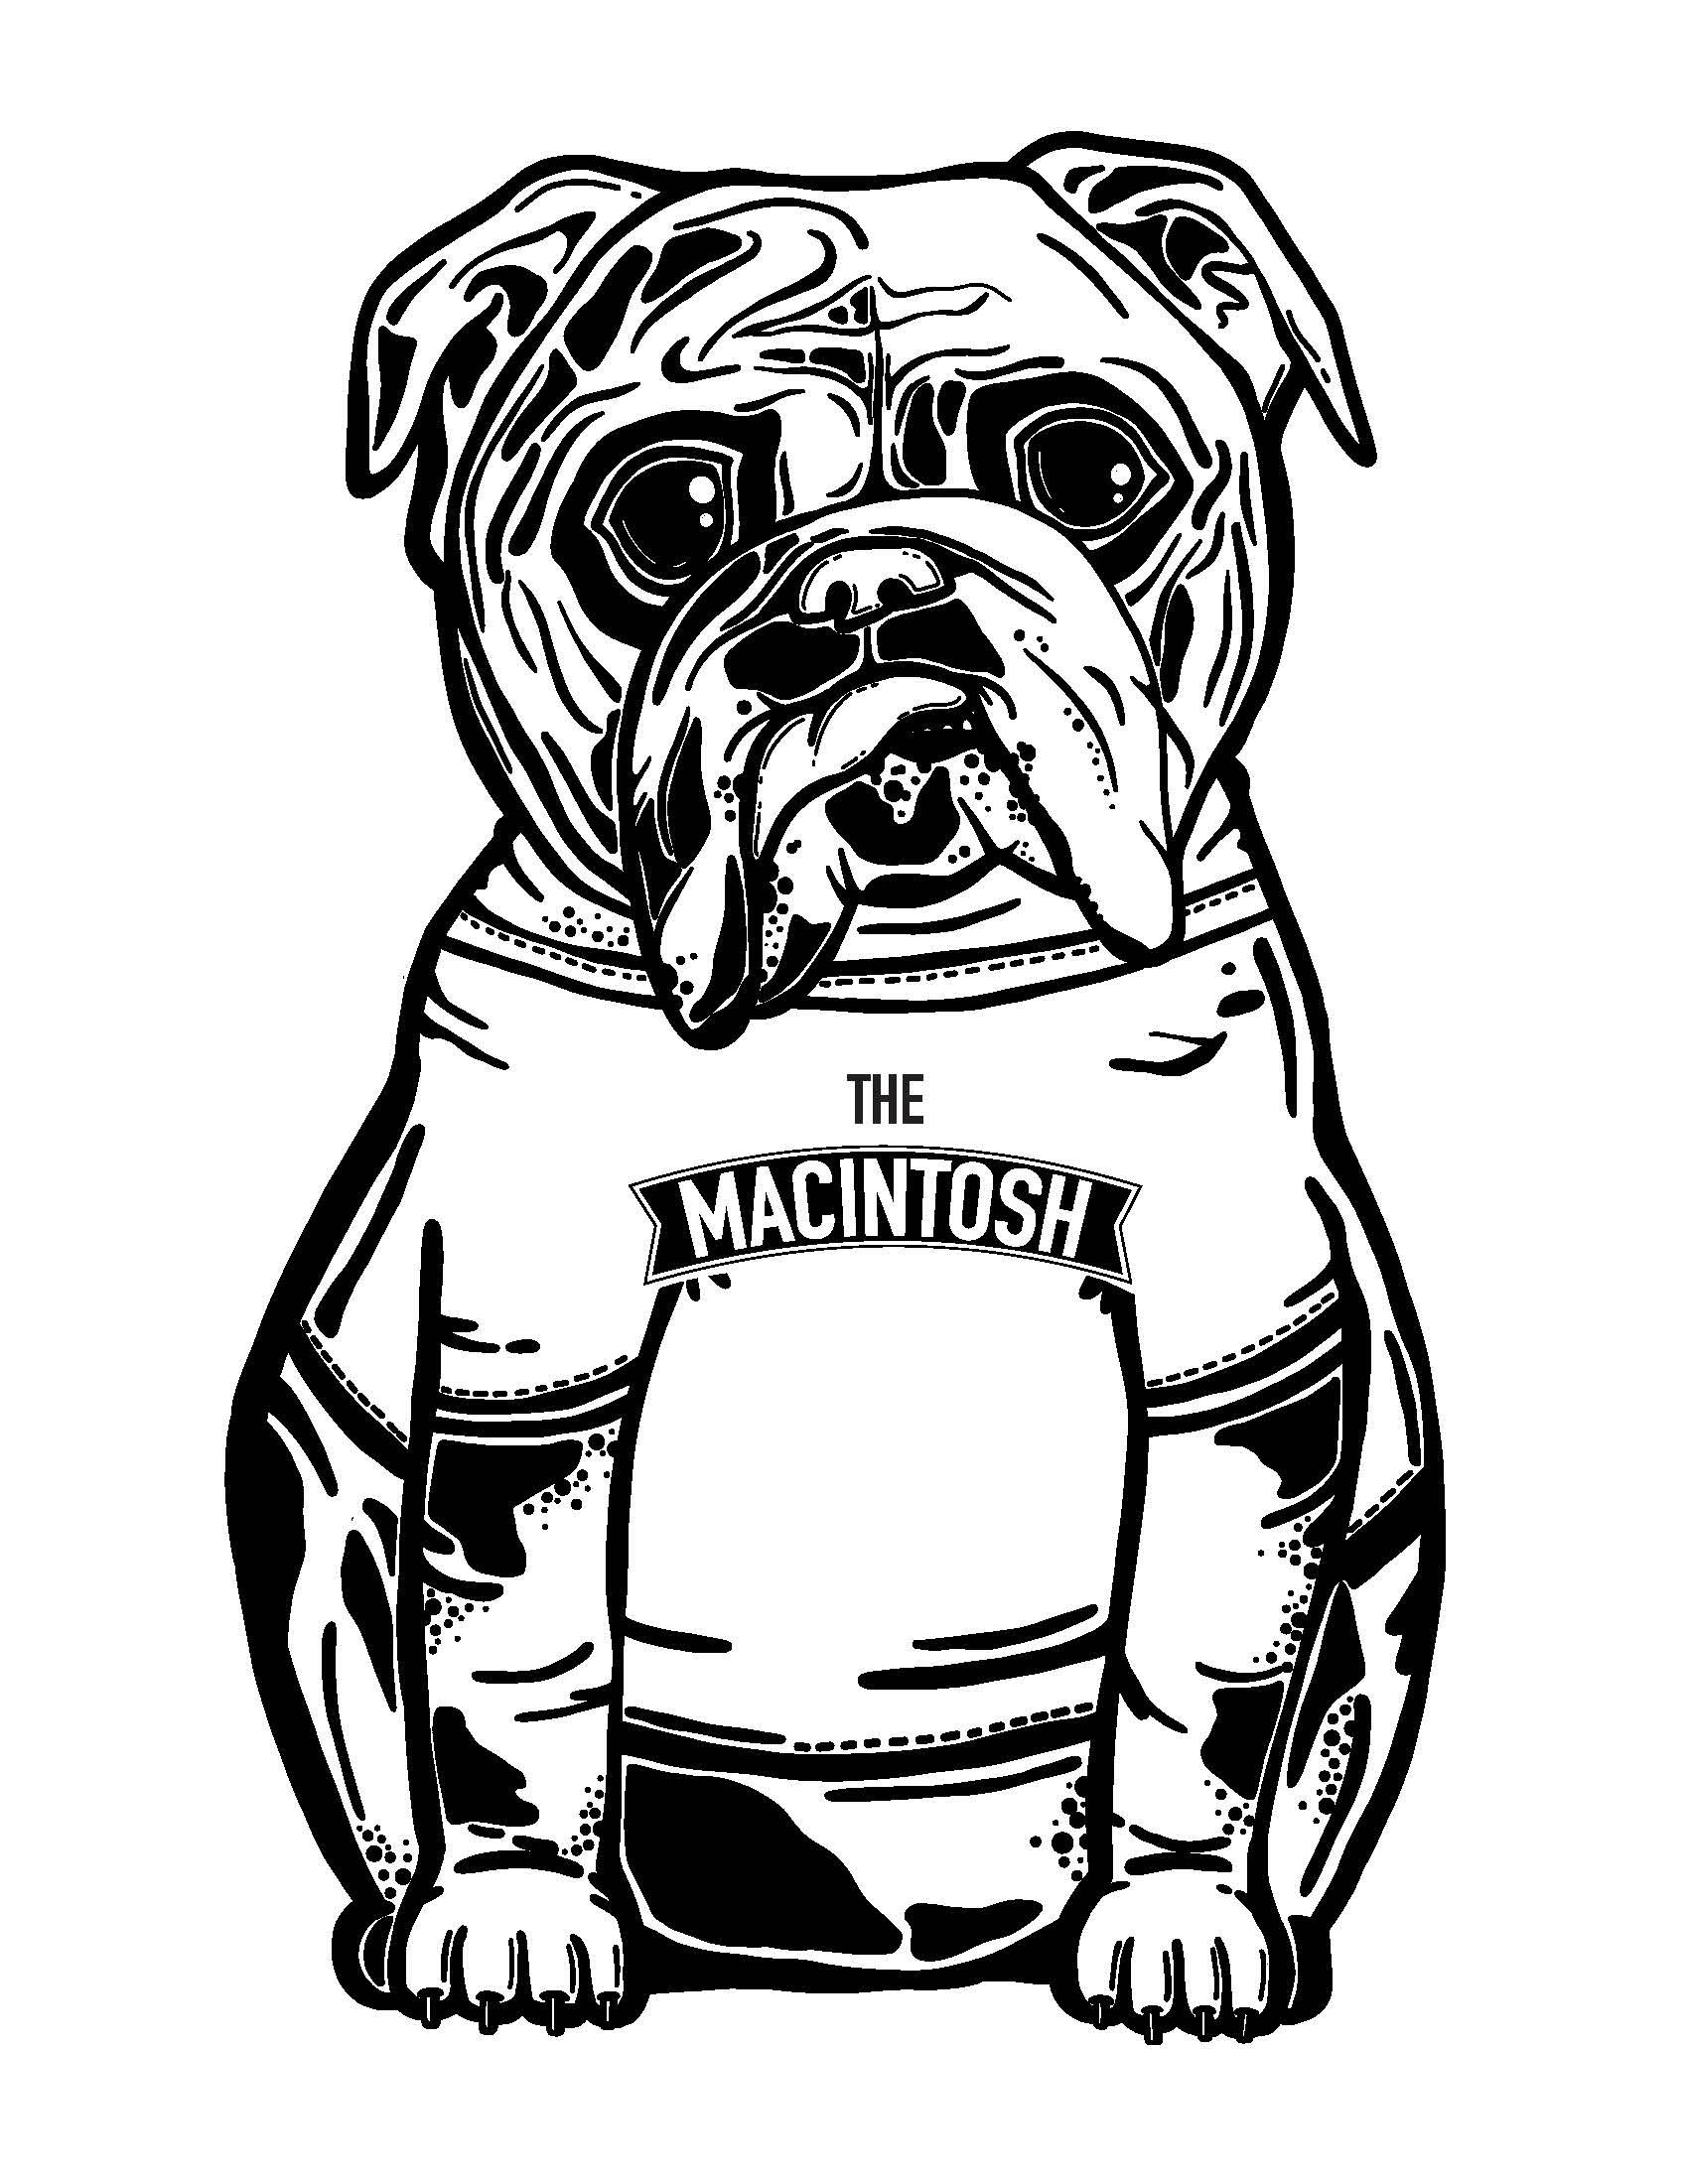 The Macintosh, t-shirt